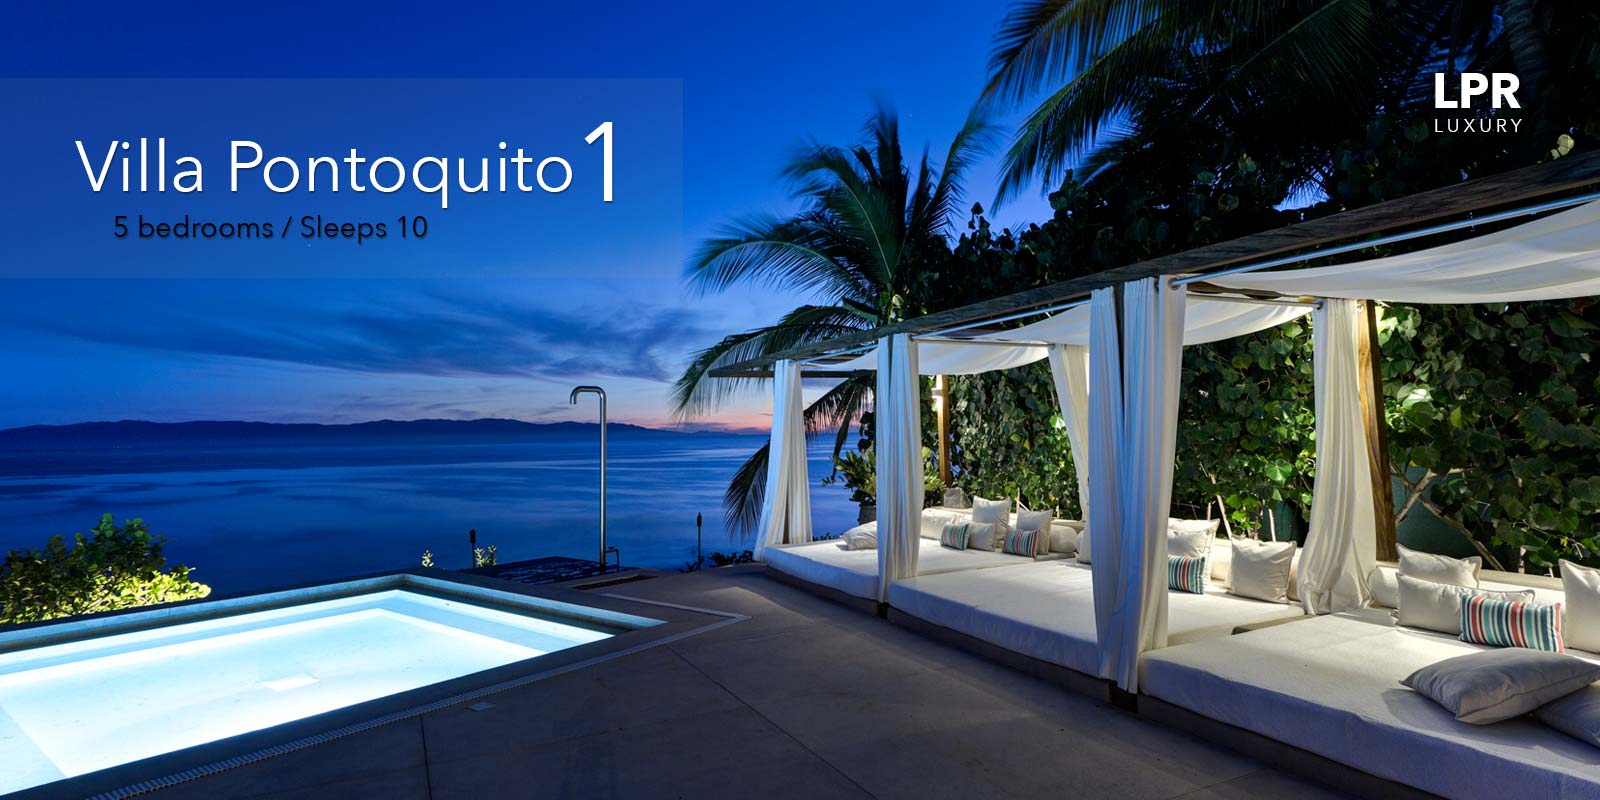 Villa Pontoquito 1 - Luxury Puerto Vallarta Real Estate